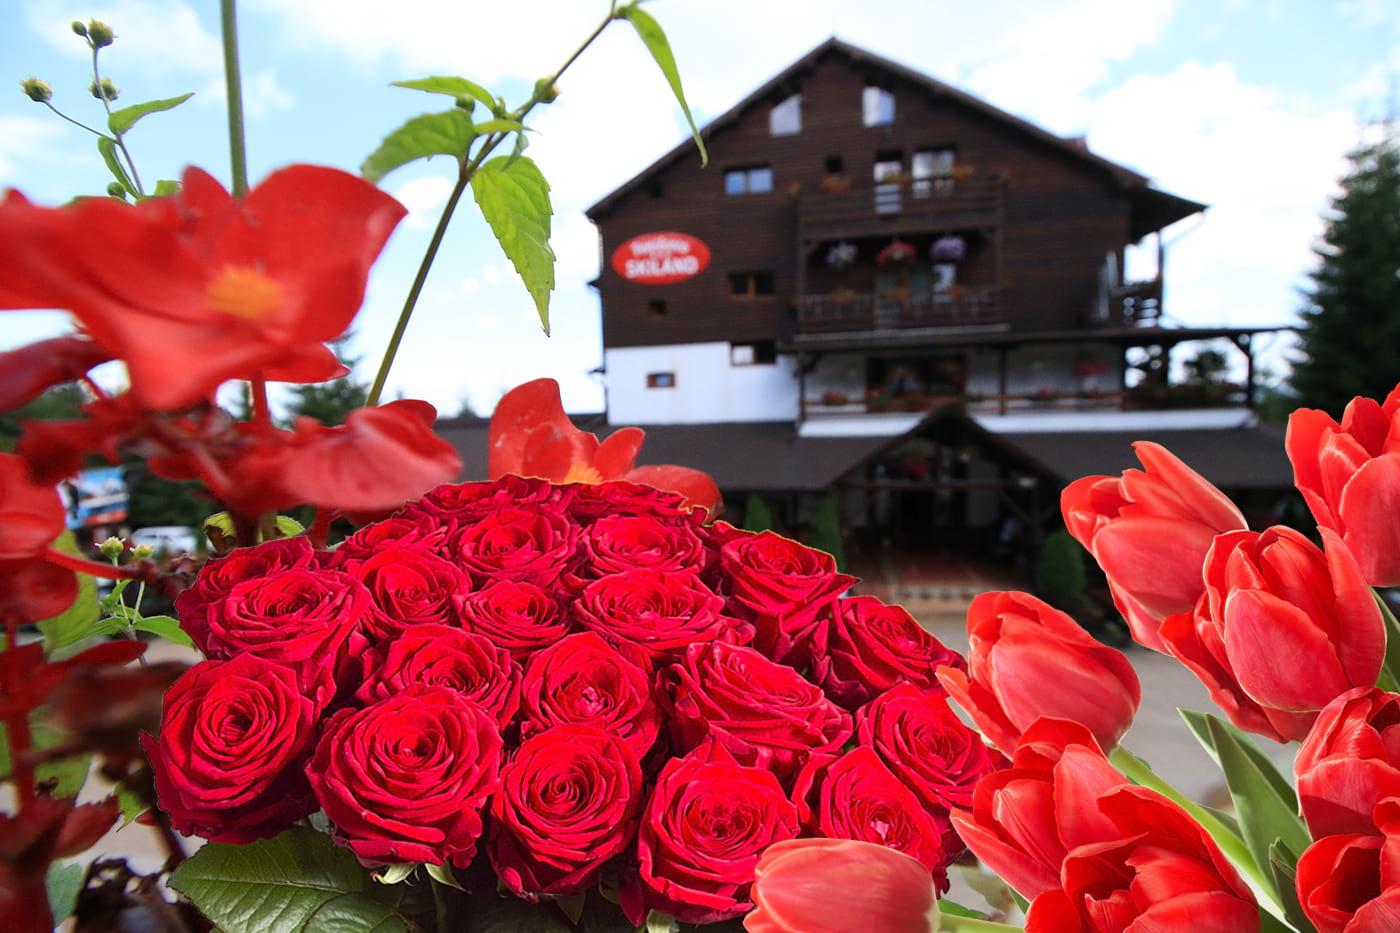 8-martie-pensiunea-skiland-baisoara-cluj-apuseni-muntele-baisorii